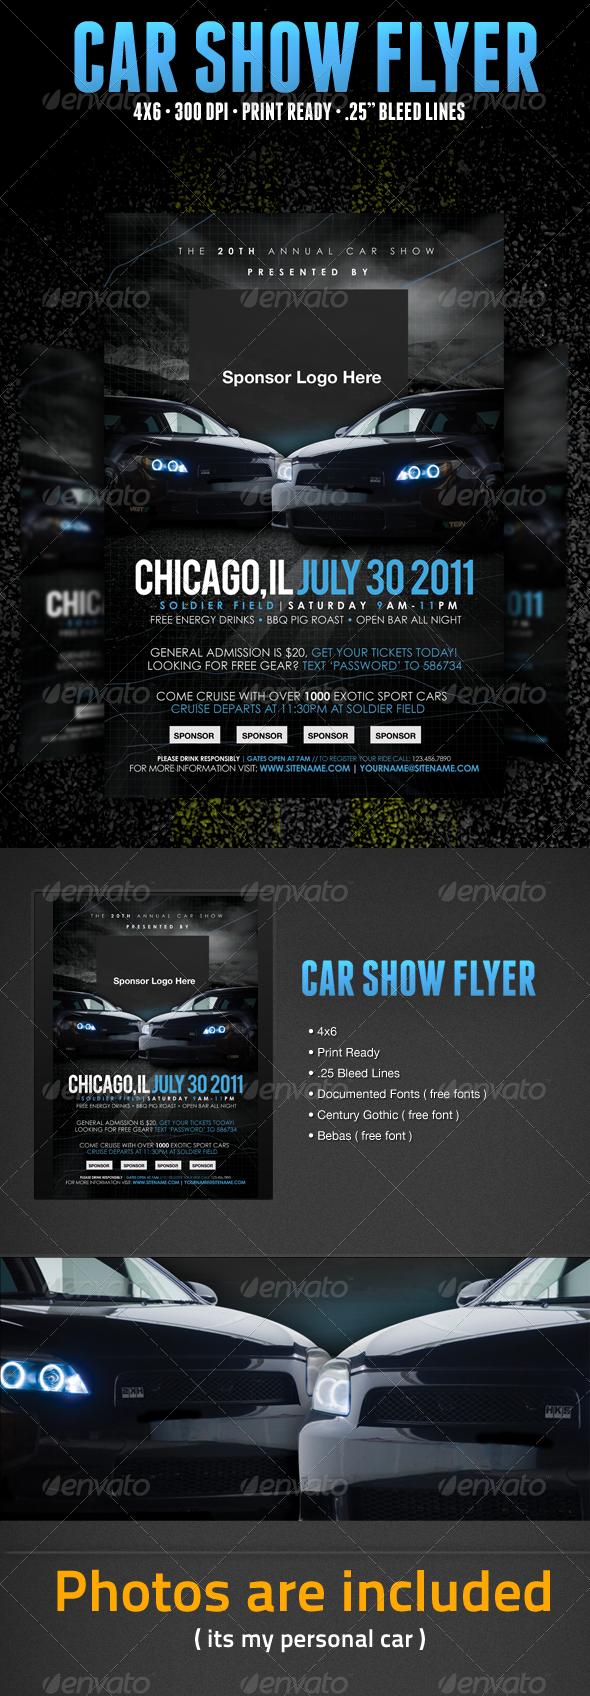 Car Show Flyer Template – Car Flyer Template